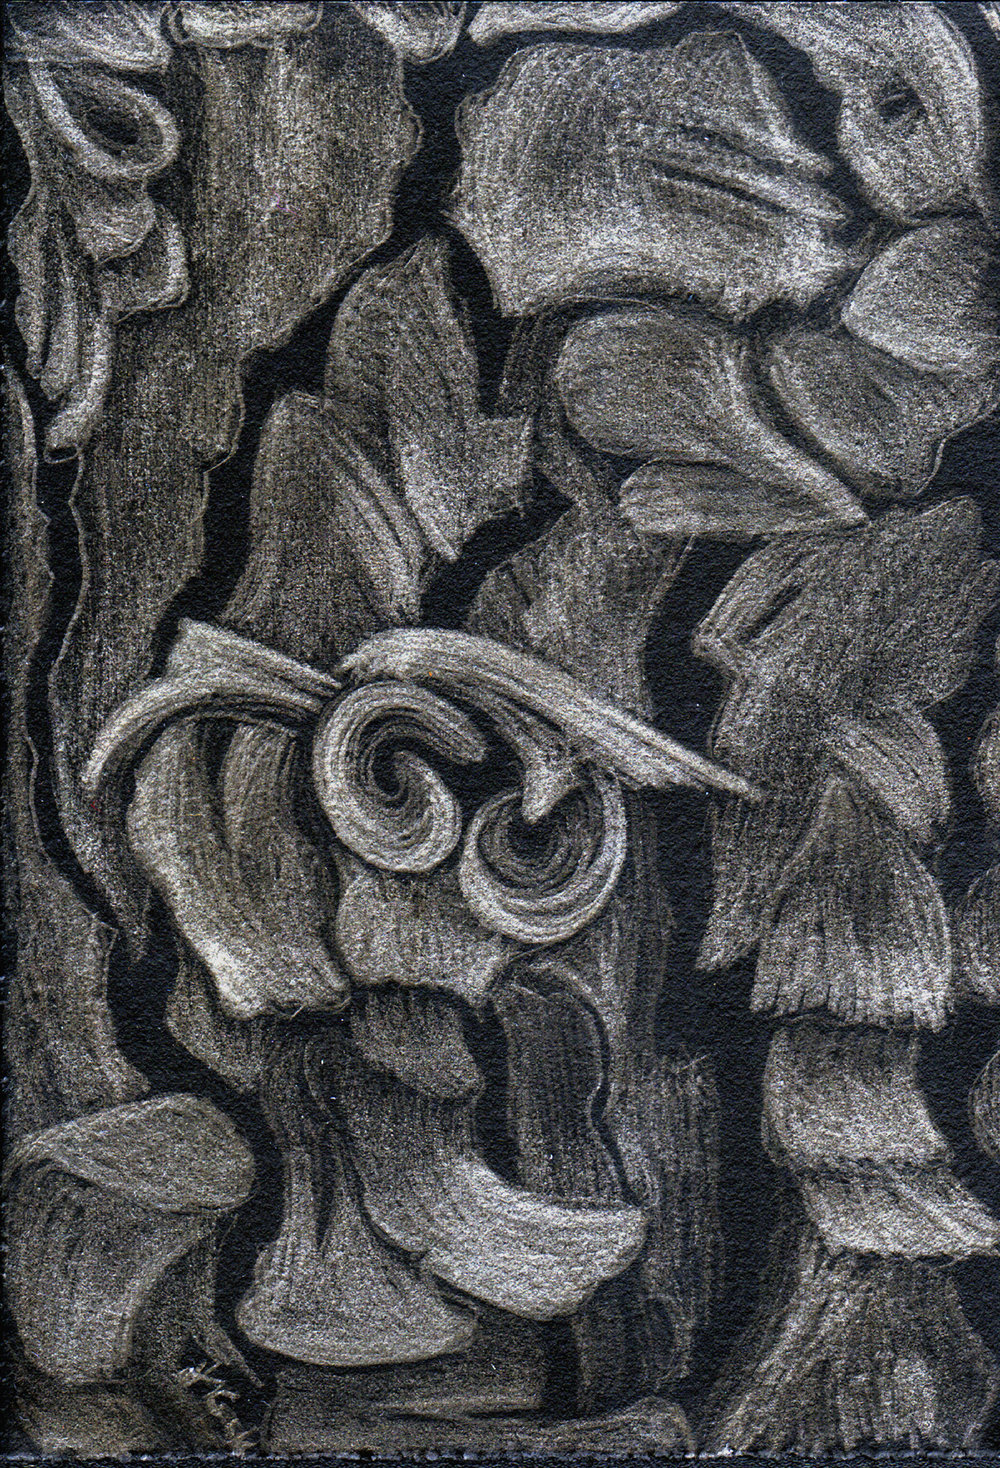 Ariadne's Thread II - pine tree bark, silverpoint on black, Jeannine Cook artist